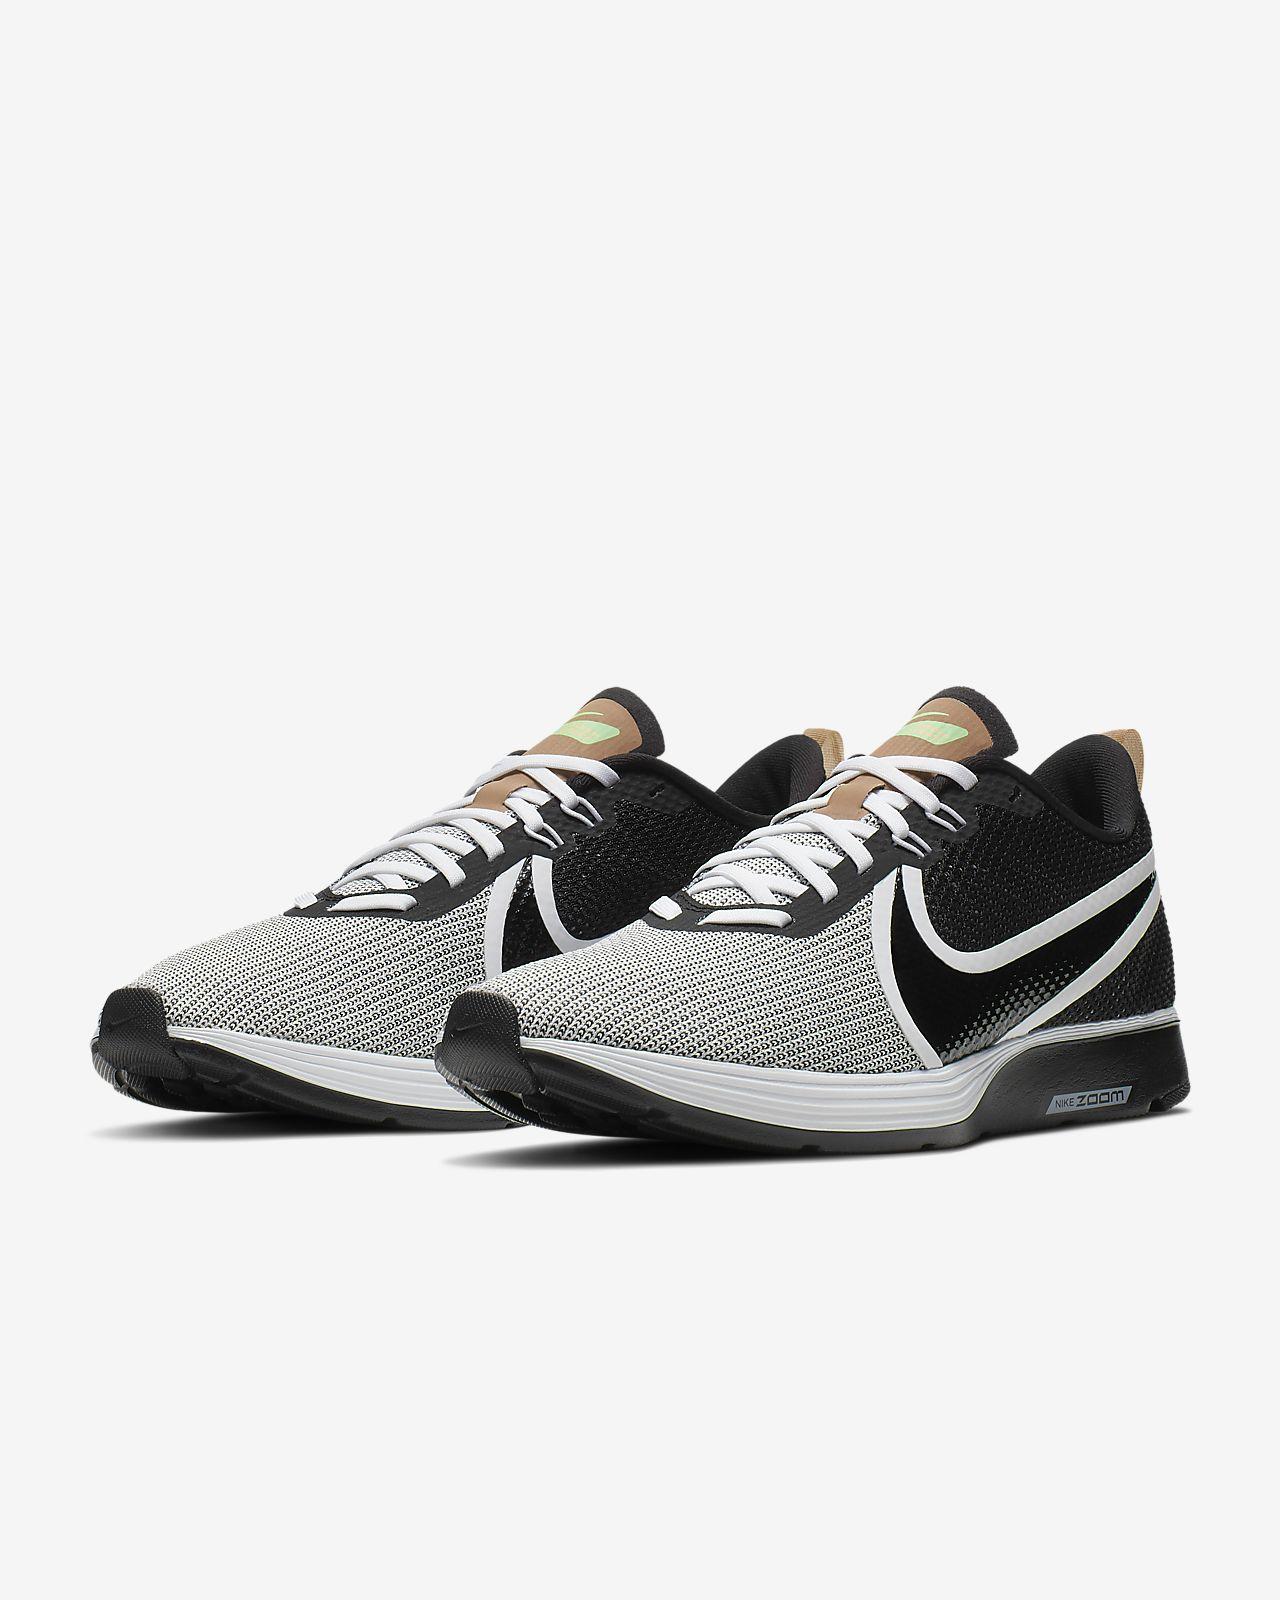 info for c2778 06e98 ... Chaussure de running Nike Zoom Strike 2 SE pour Homme